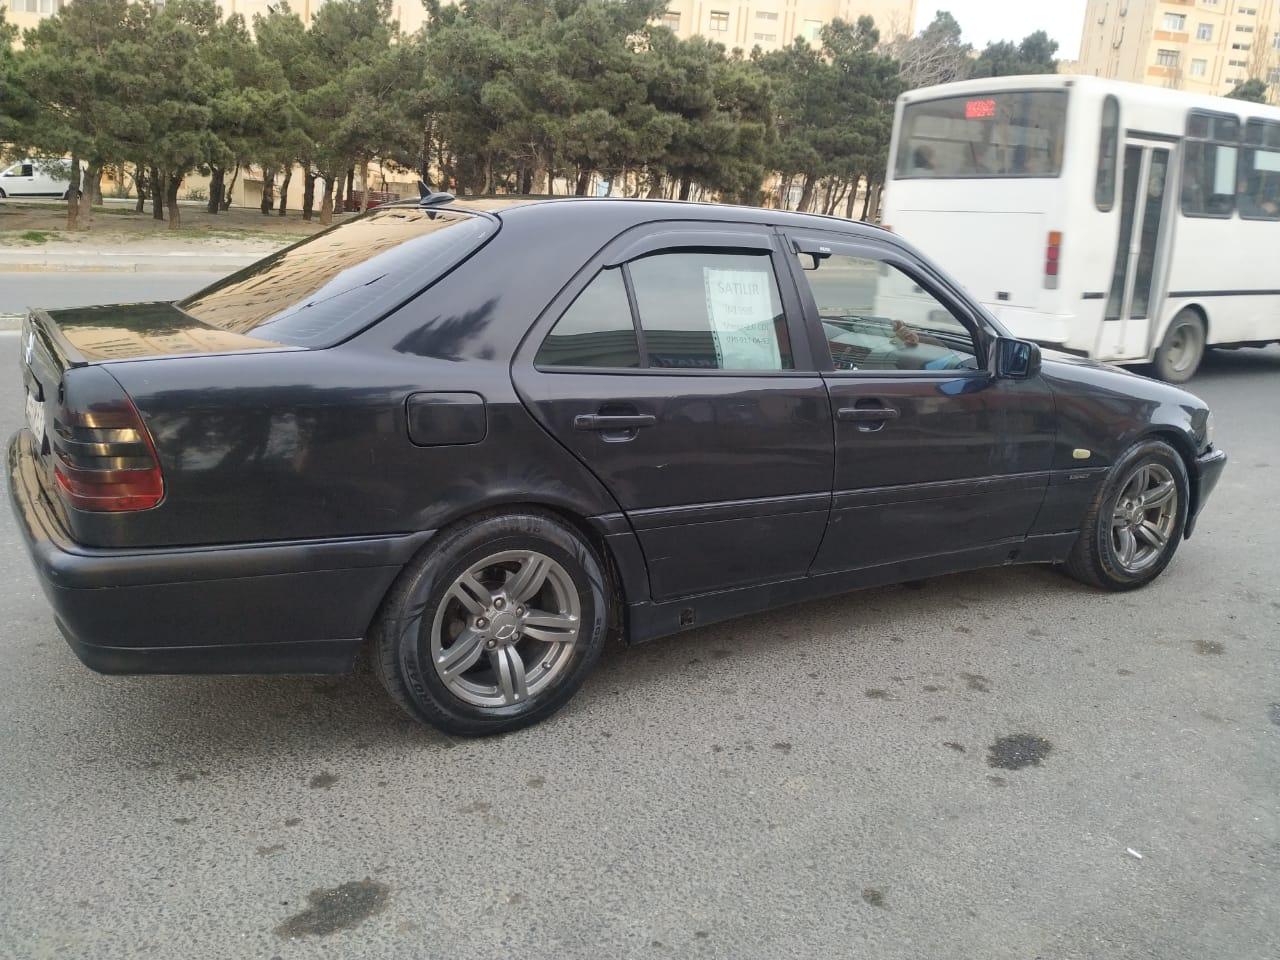 Mercedes-Benz C 200 2.0(lt) 1998 Second hand  $6500